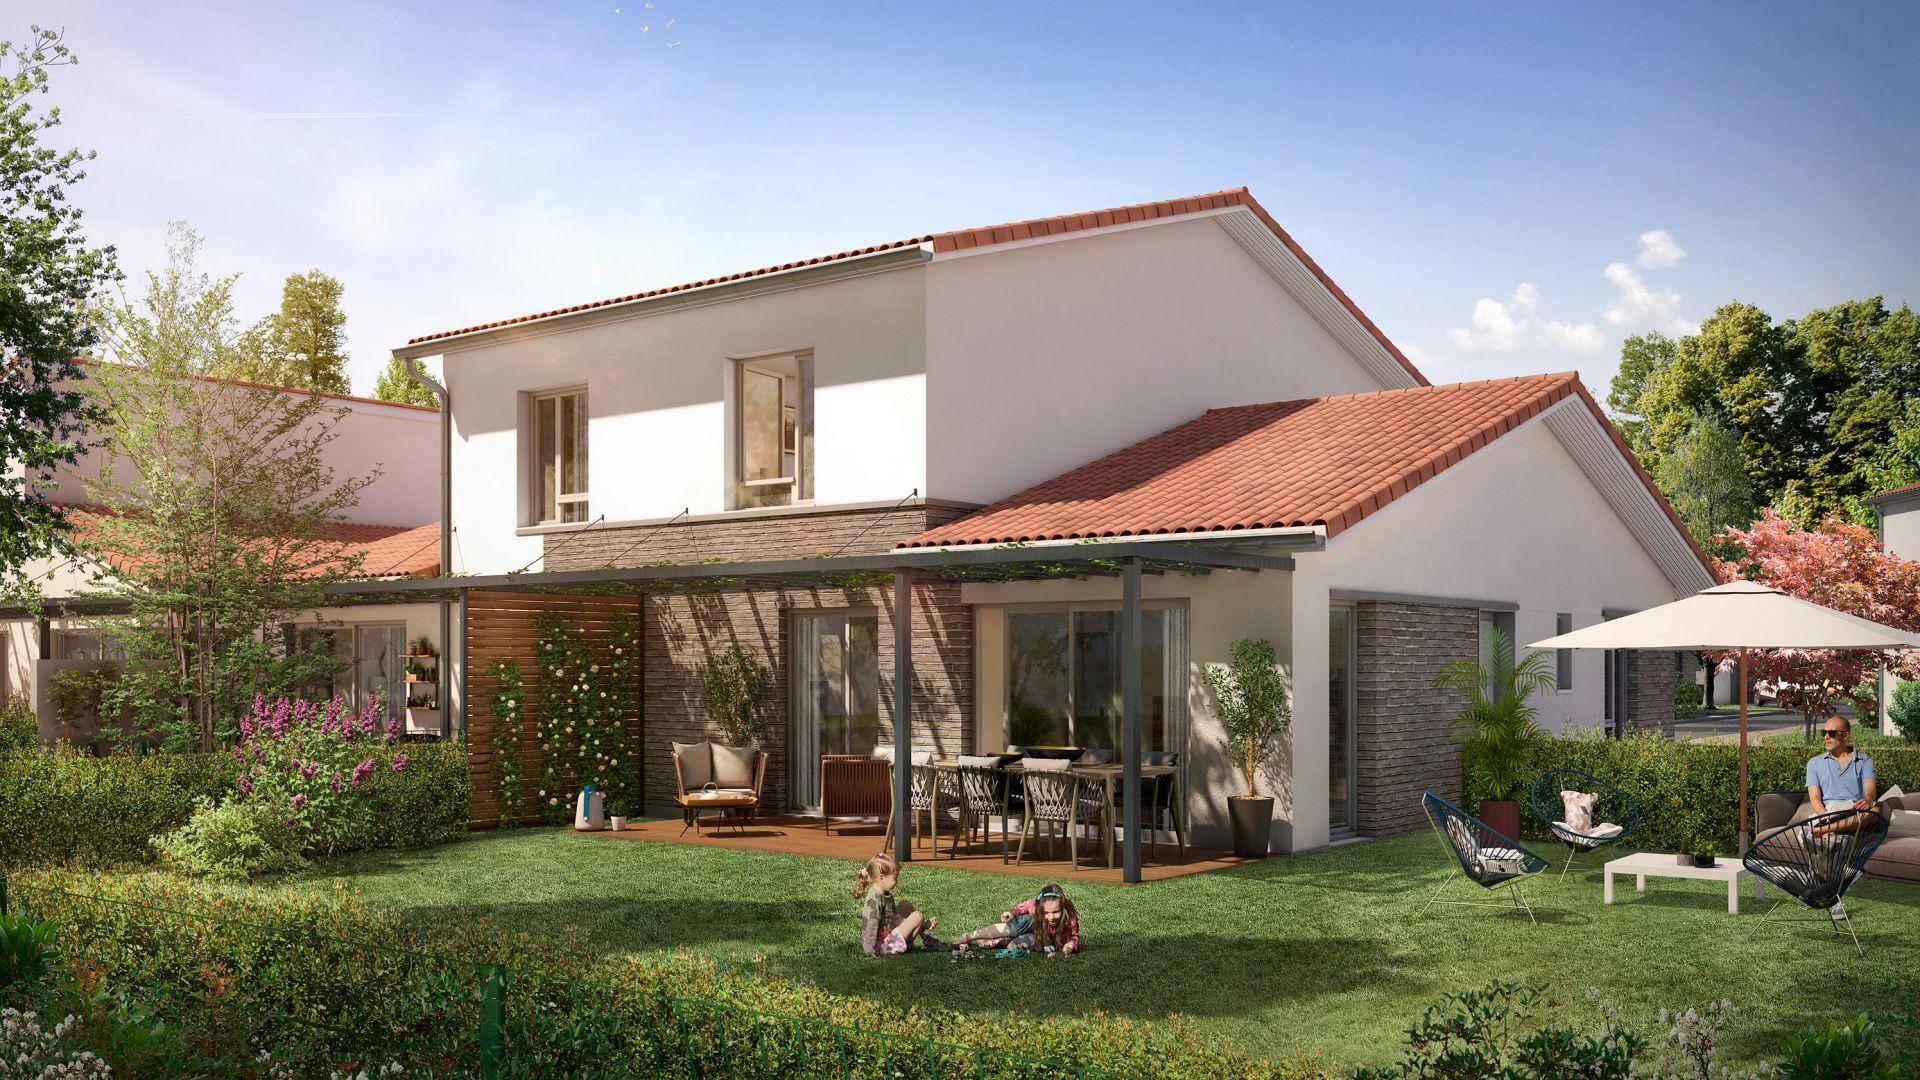 GreenCity Immobilier-La Bastide D'Adèle-Tournefeuille-31170-Villa T4